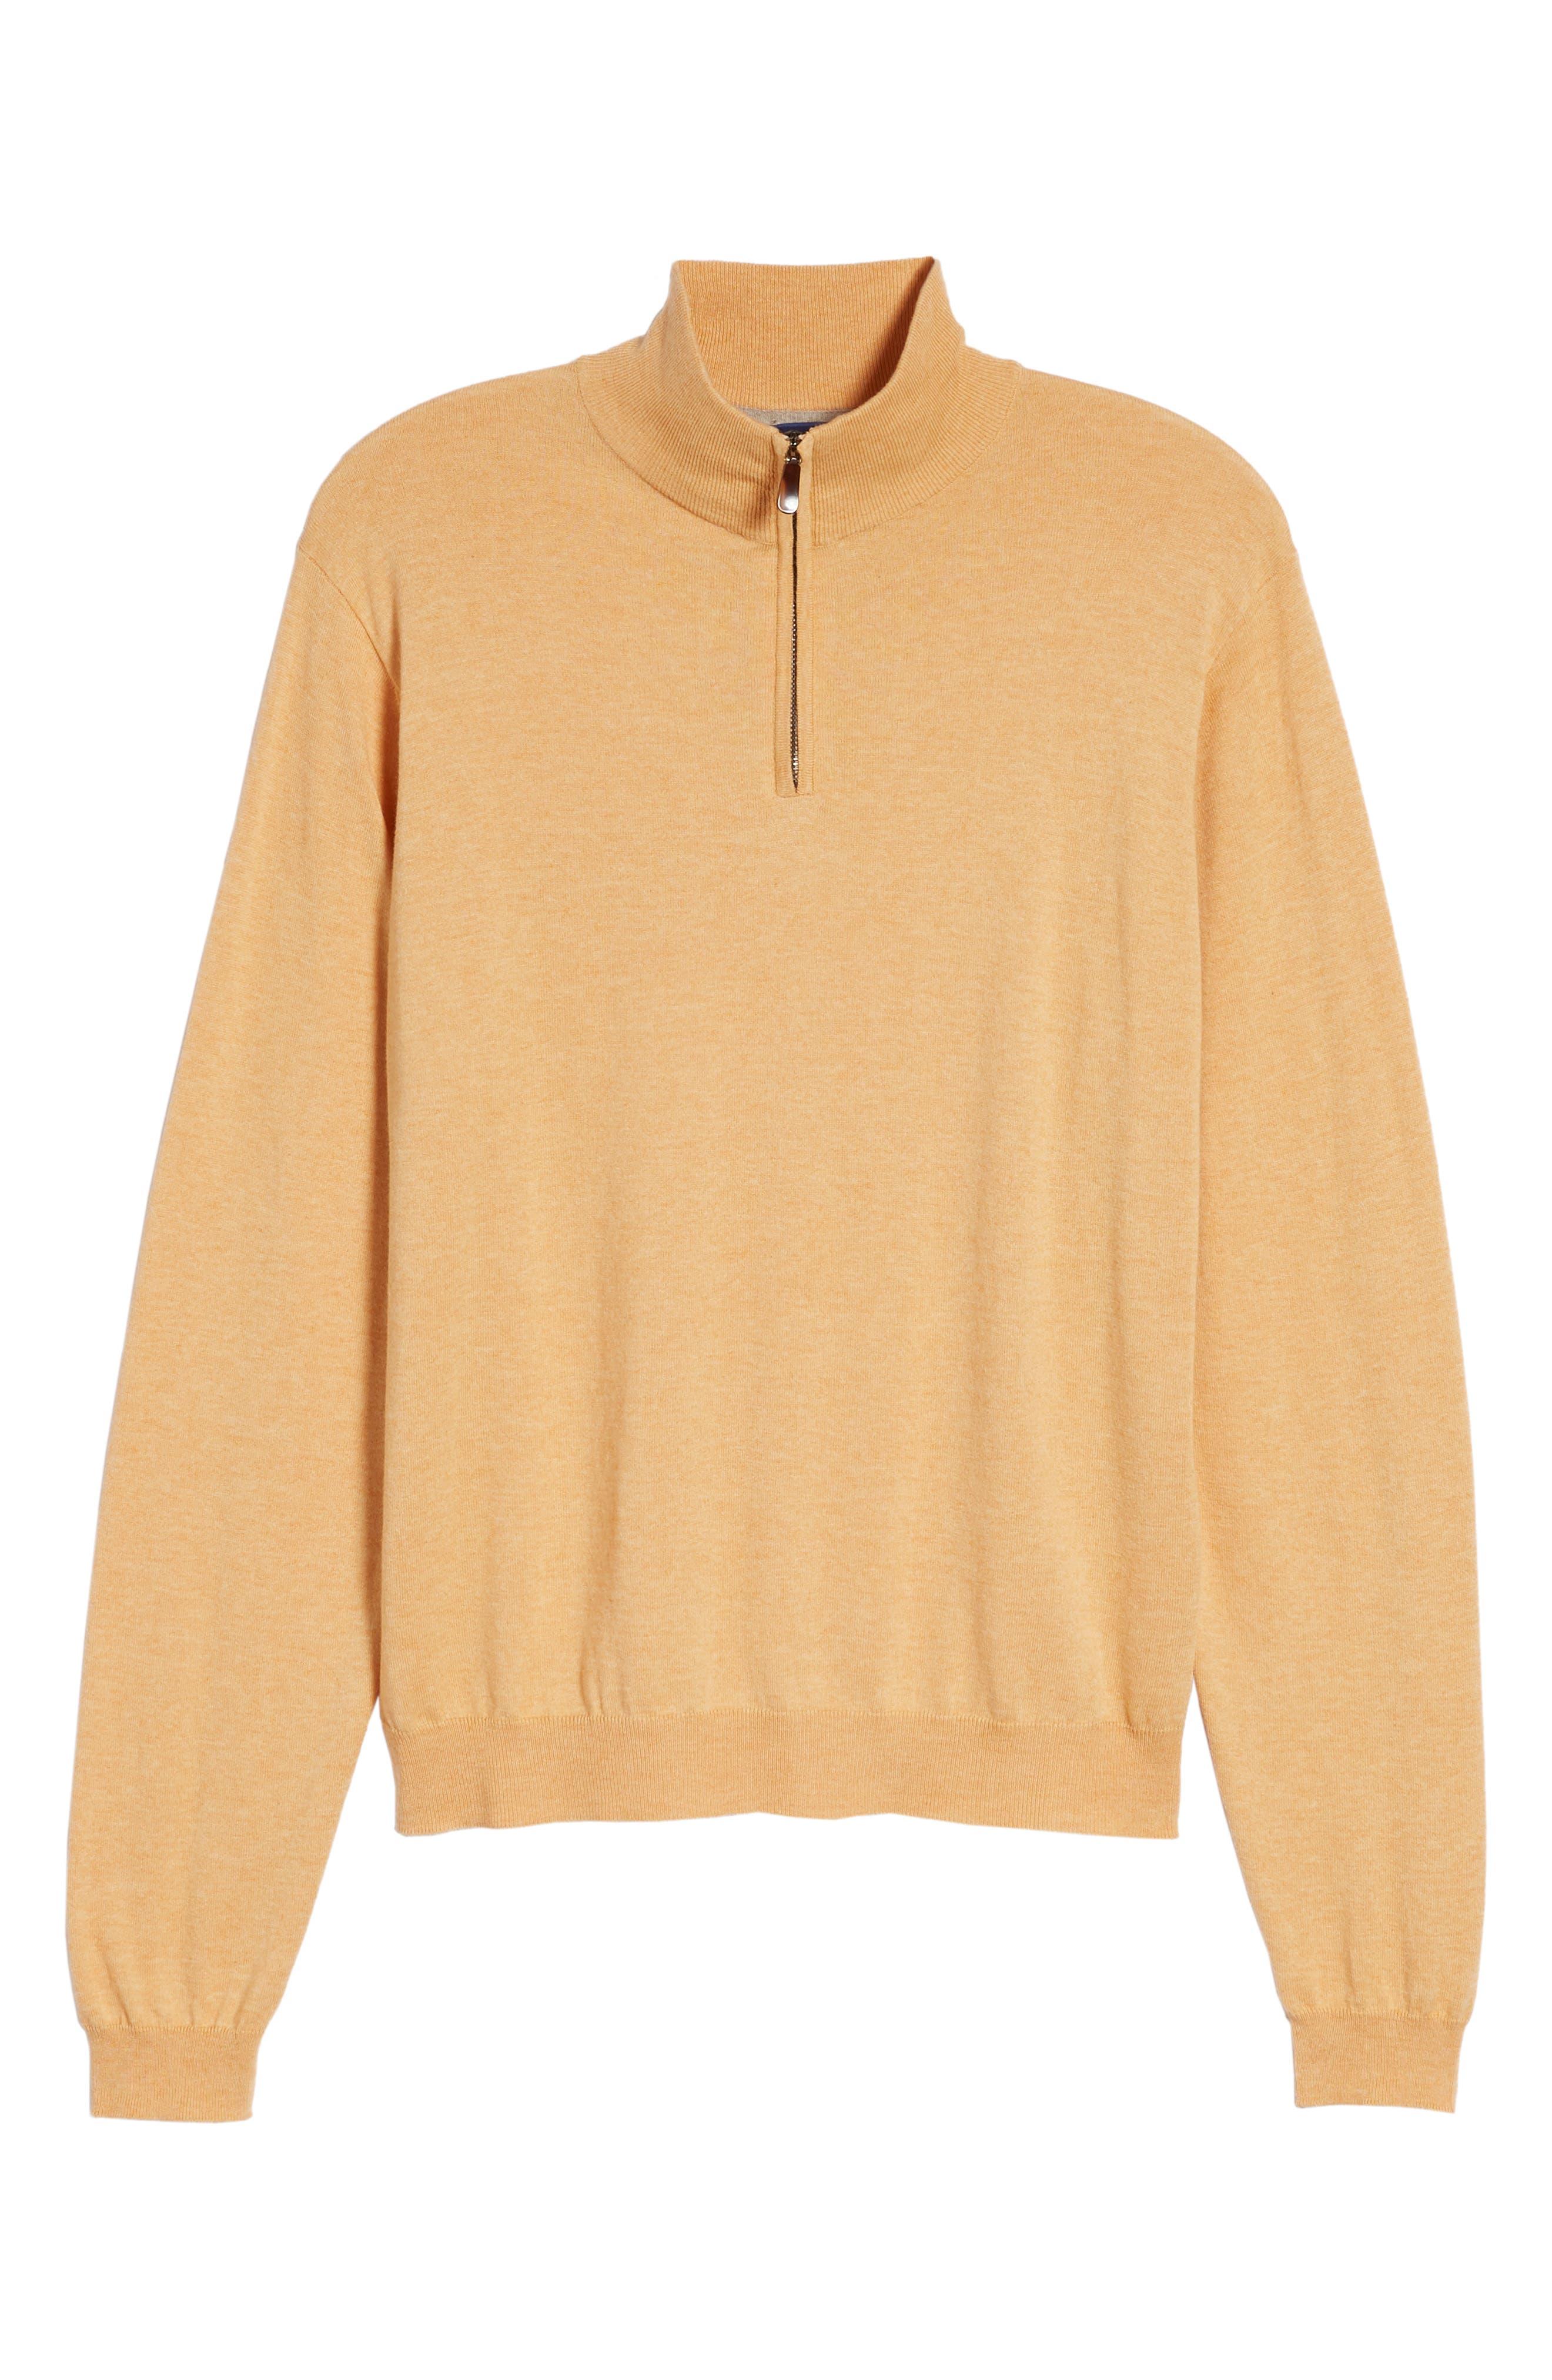 Cotton & Silk Quarter Zip Pullover,                             Alternate thumbnail 6, color,                             830